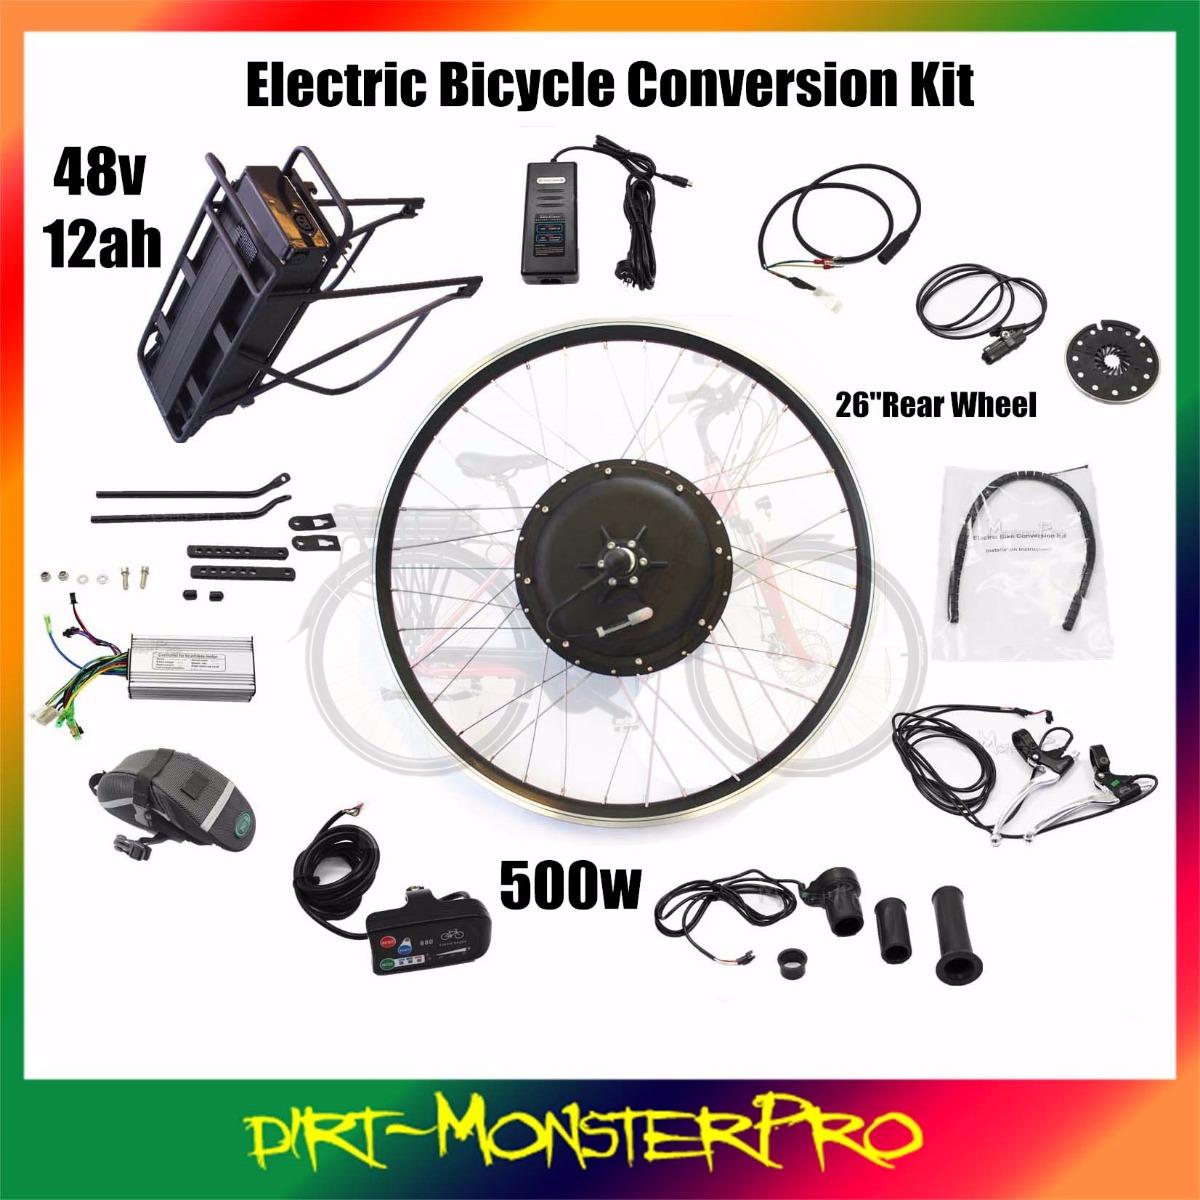 Electric Motor Kits For Push Bikes: DIY Ebike Electric Bike Kit 12ah Li-ion Battery Included